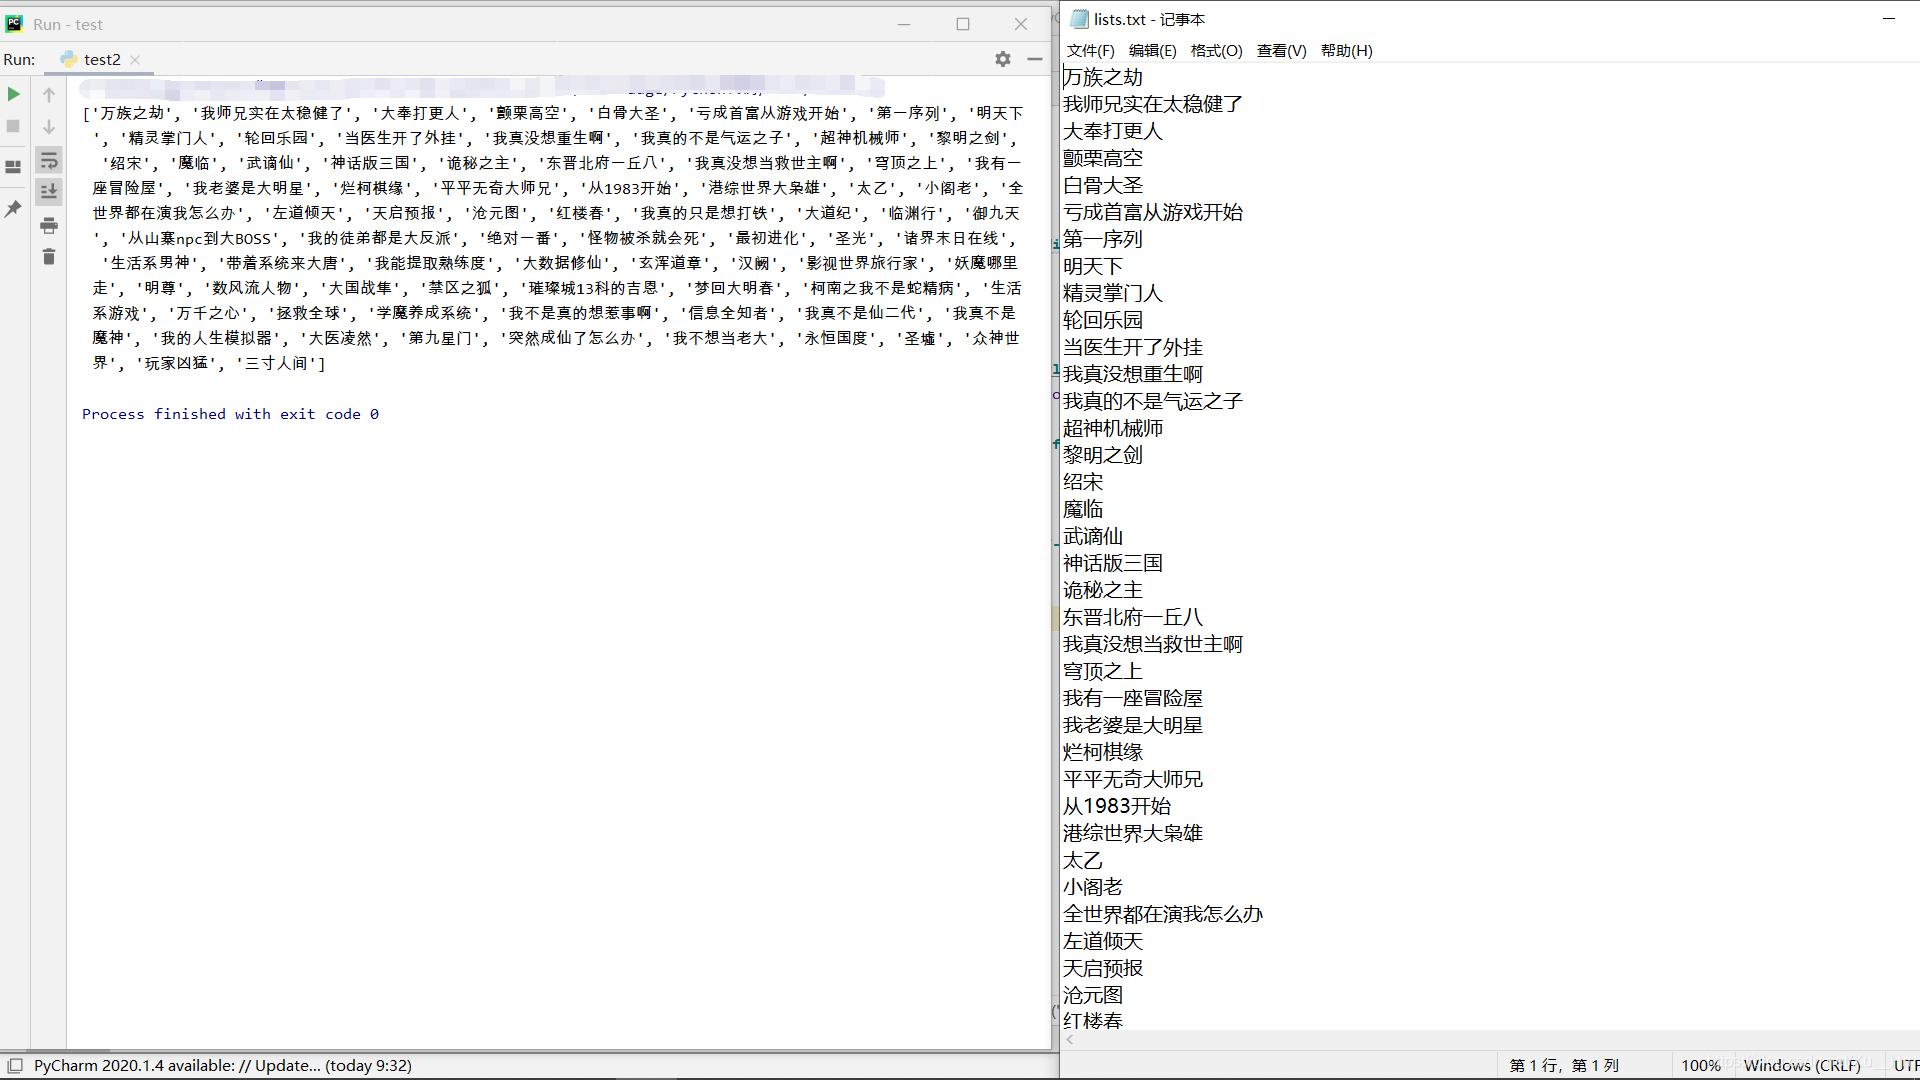 Python3网络爬虫基本操作(二):静态网页抓取XuHn的博客-